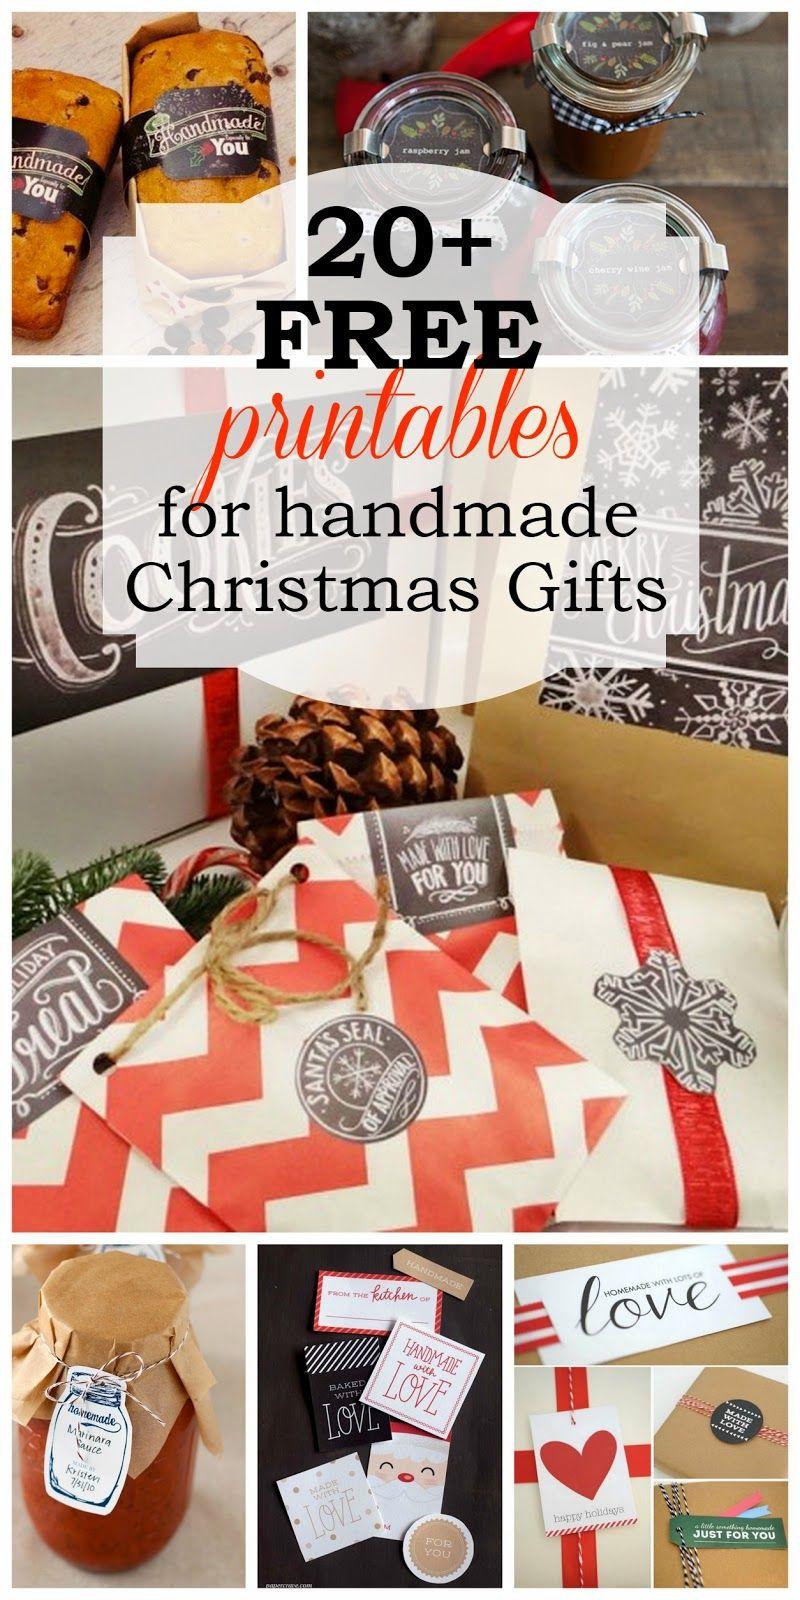 Harris Sisters GirlTalk: 20+ Free Printables for Handmade Christmas Gifts